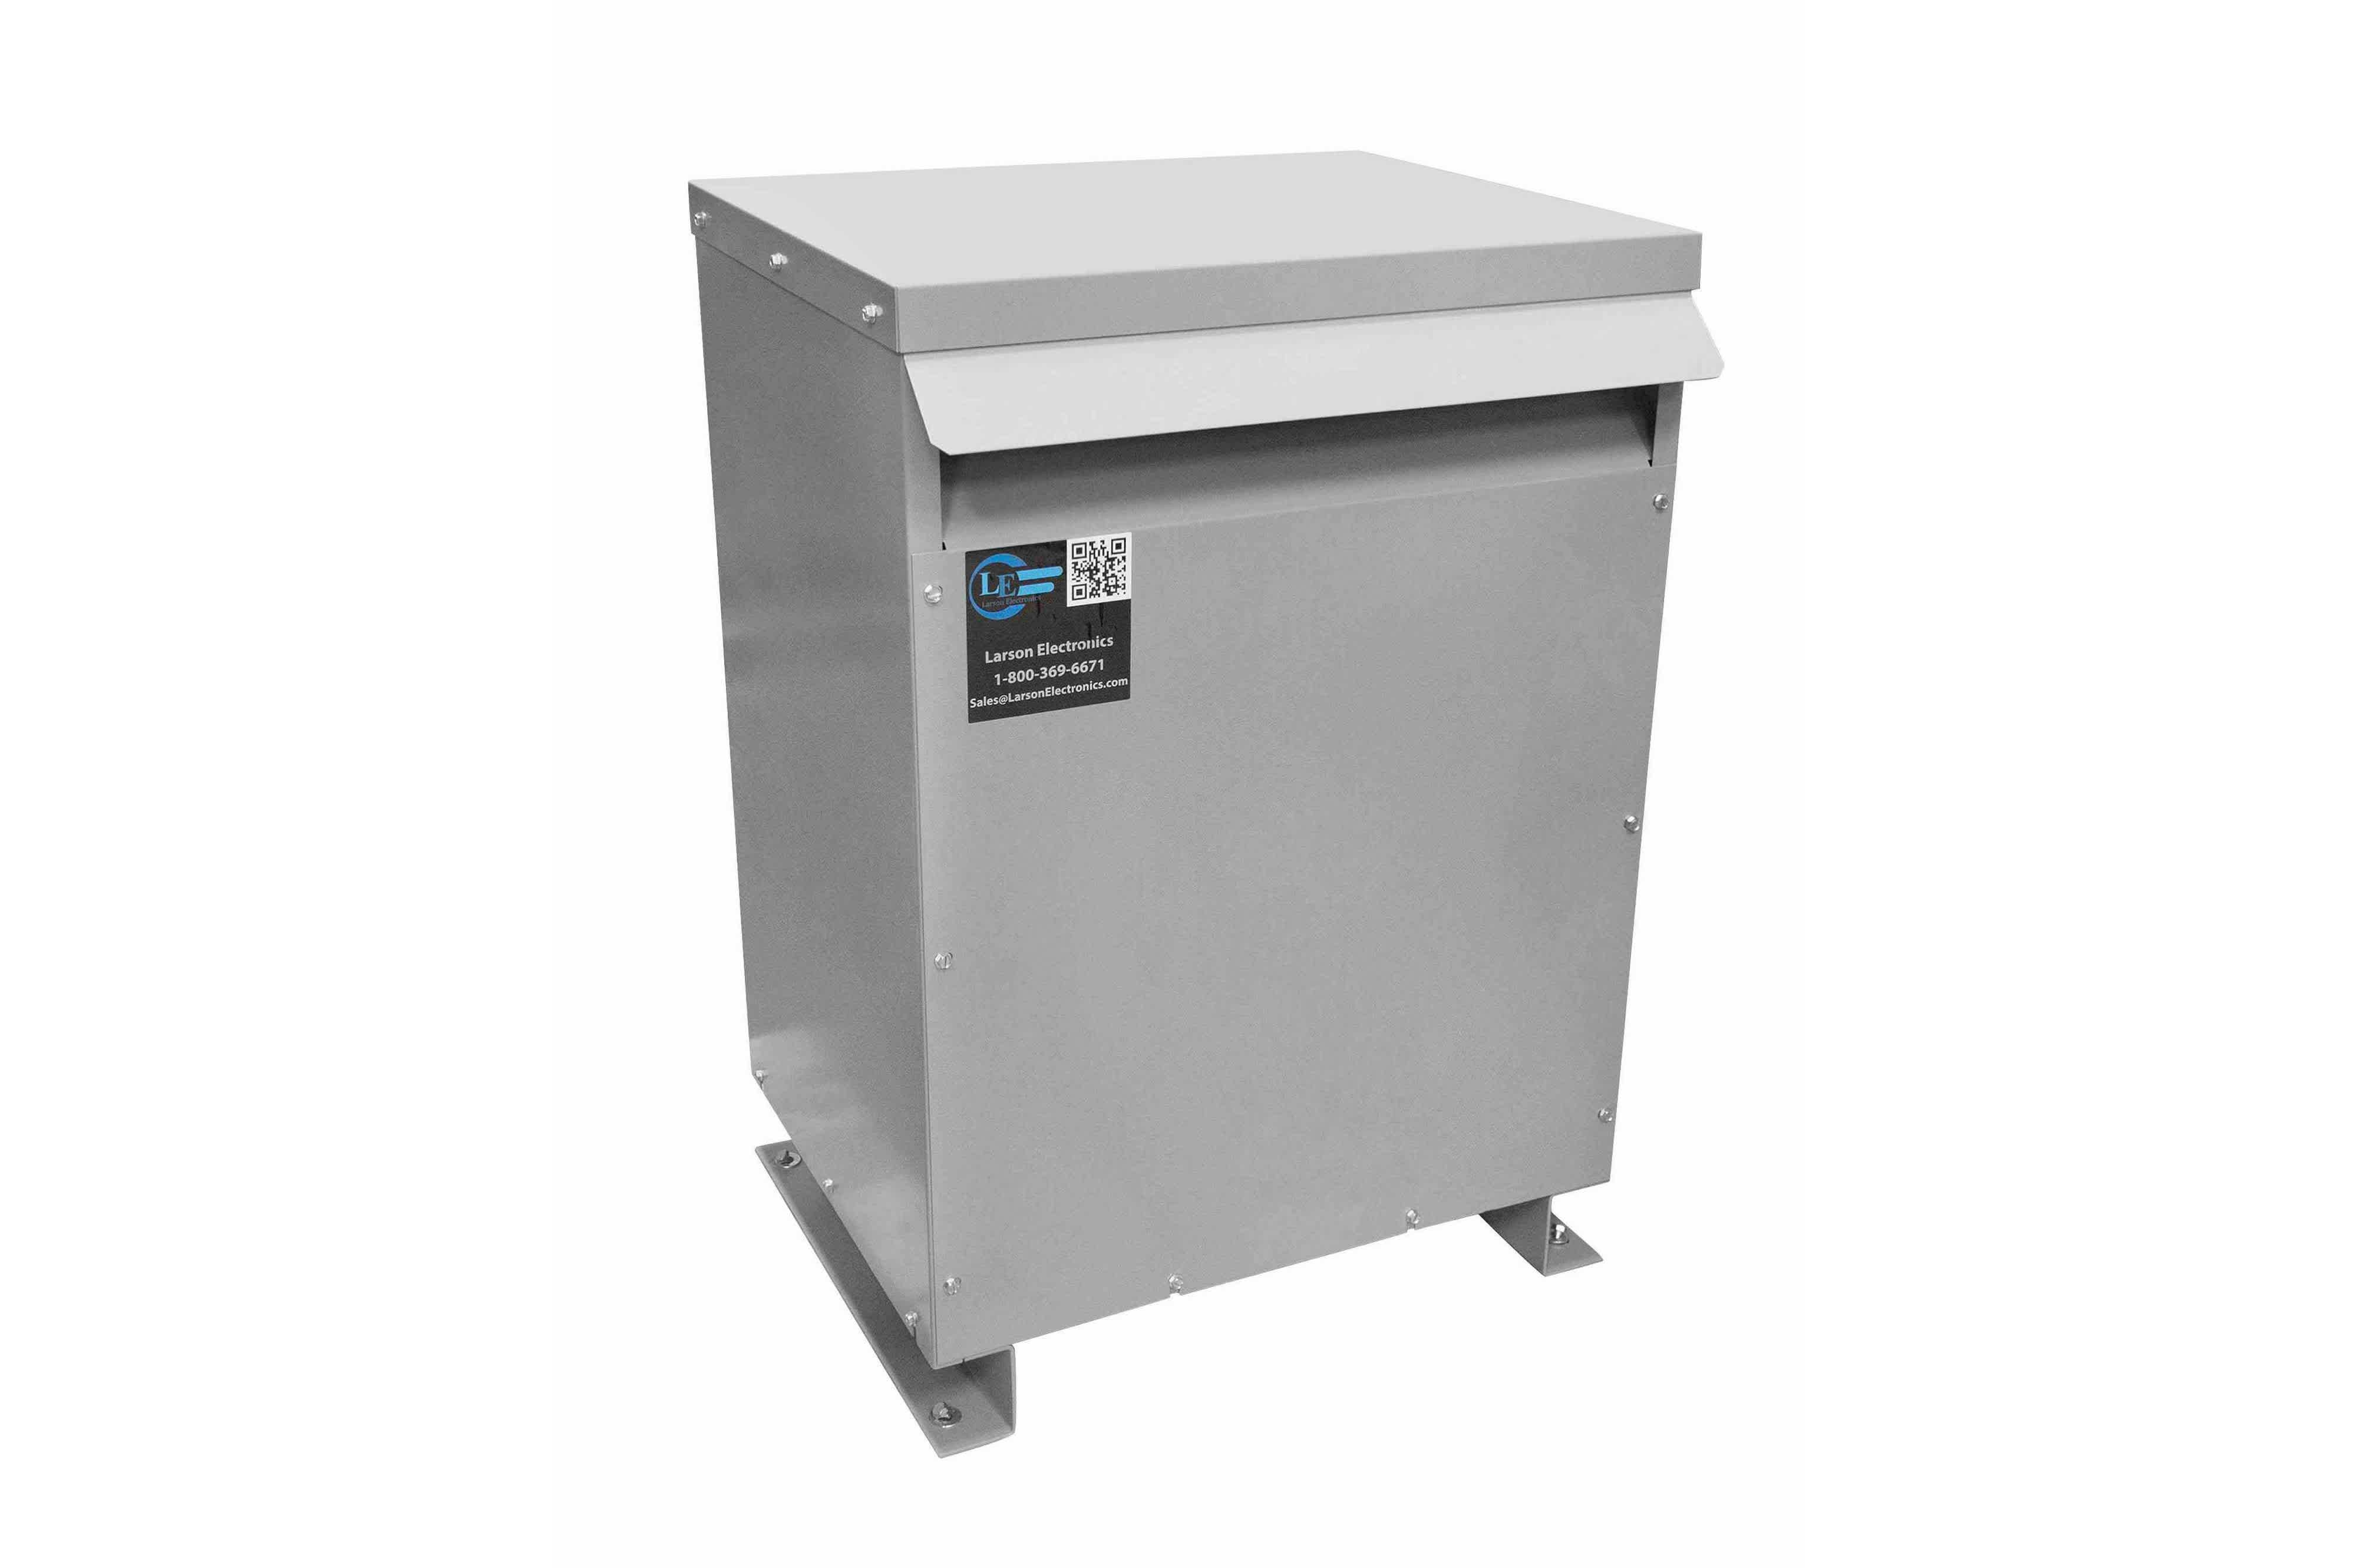 175 kVA 3PH Isolation Transformer, 208V Wye Primary, 480V Delta Secondary, N3R, Ventilated, 60 Hz